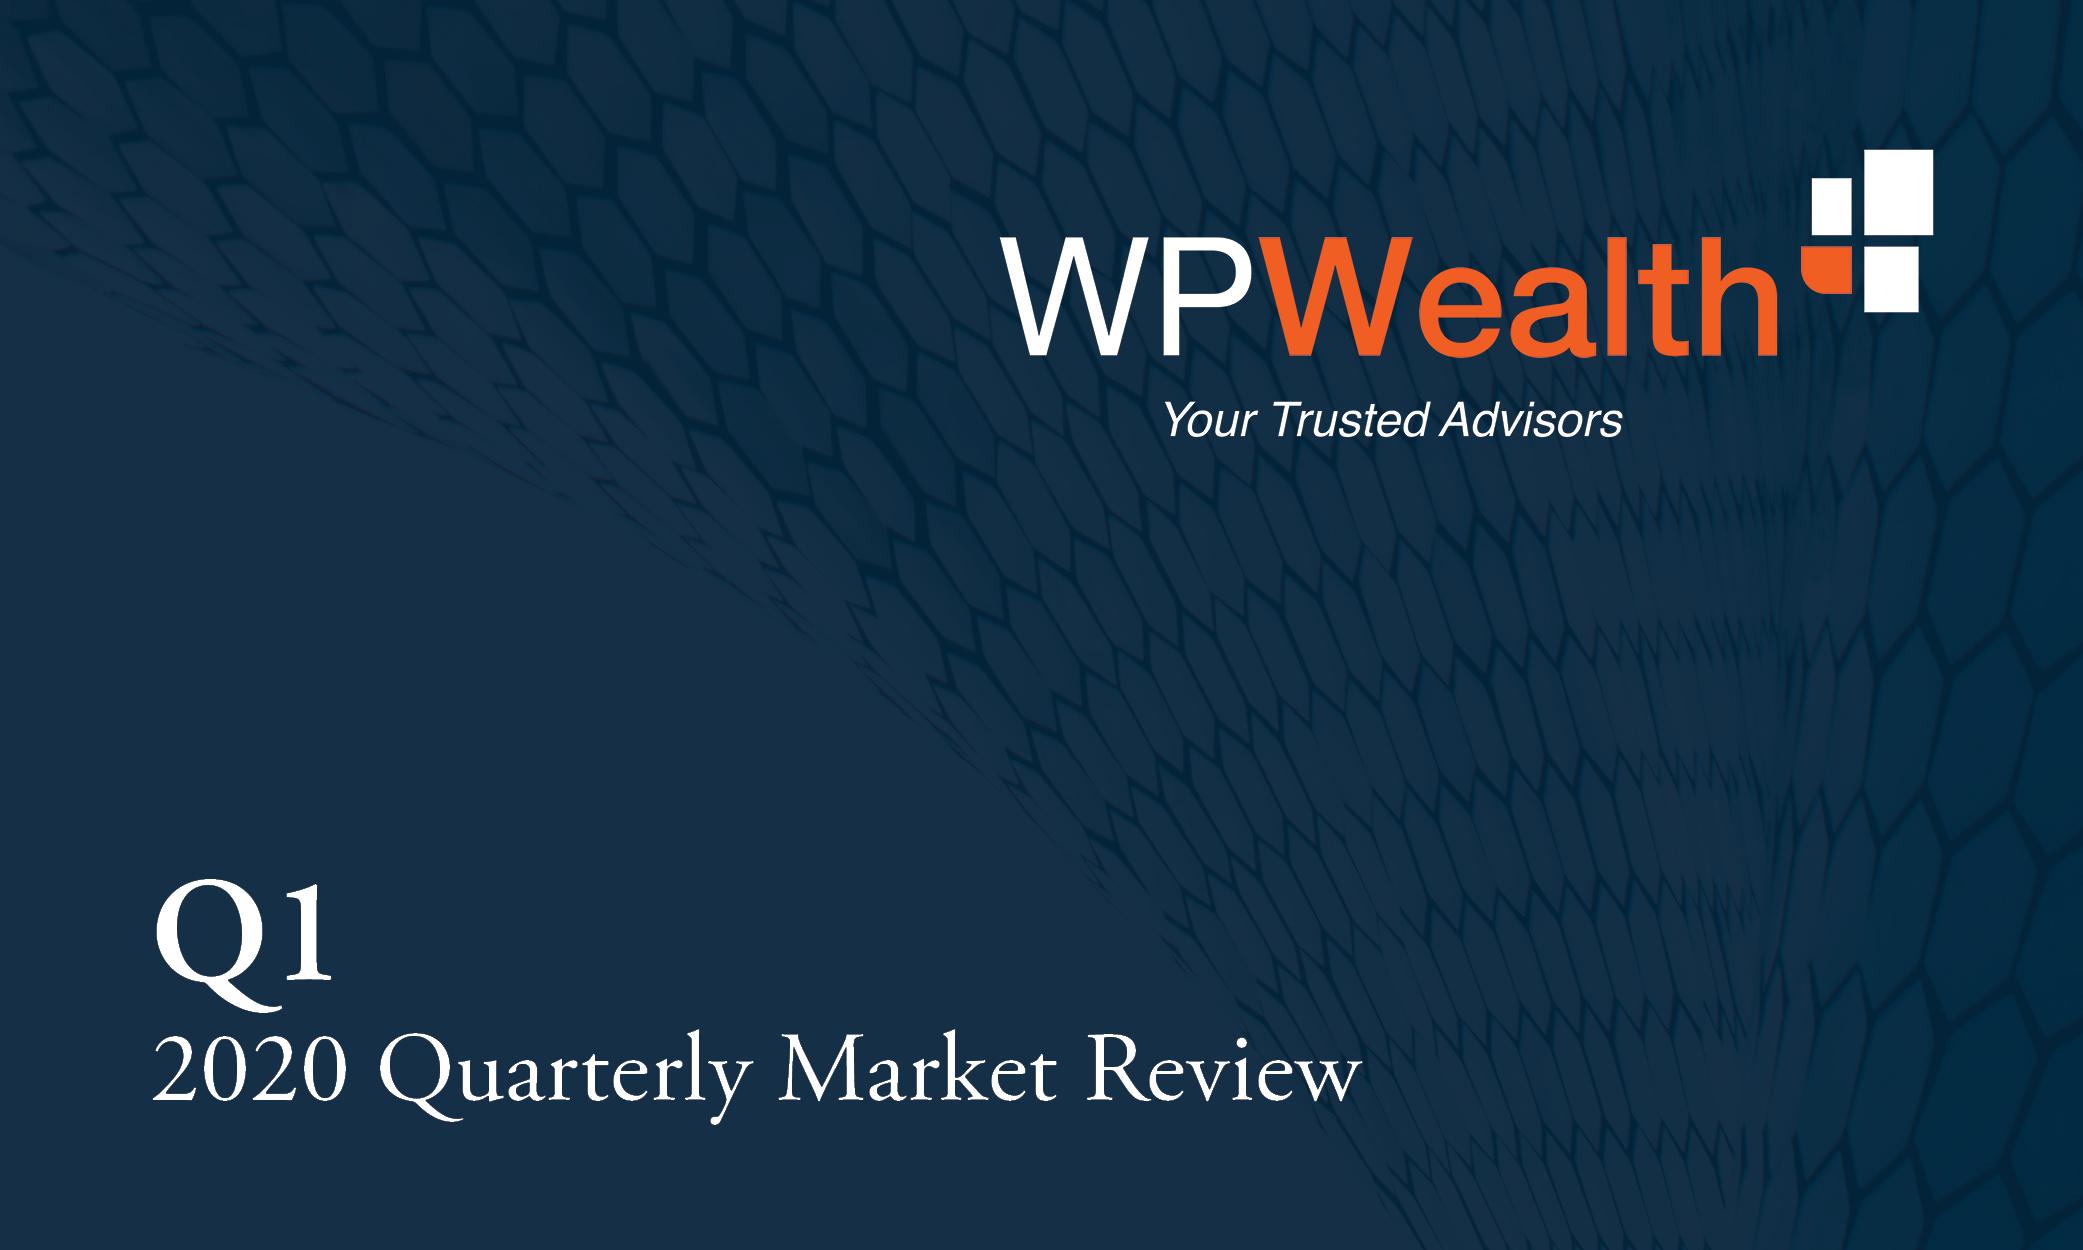 WPWealth Quarterly Market Review Q1 2020